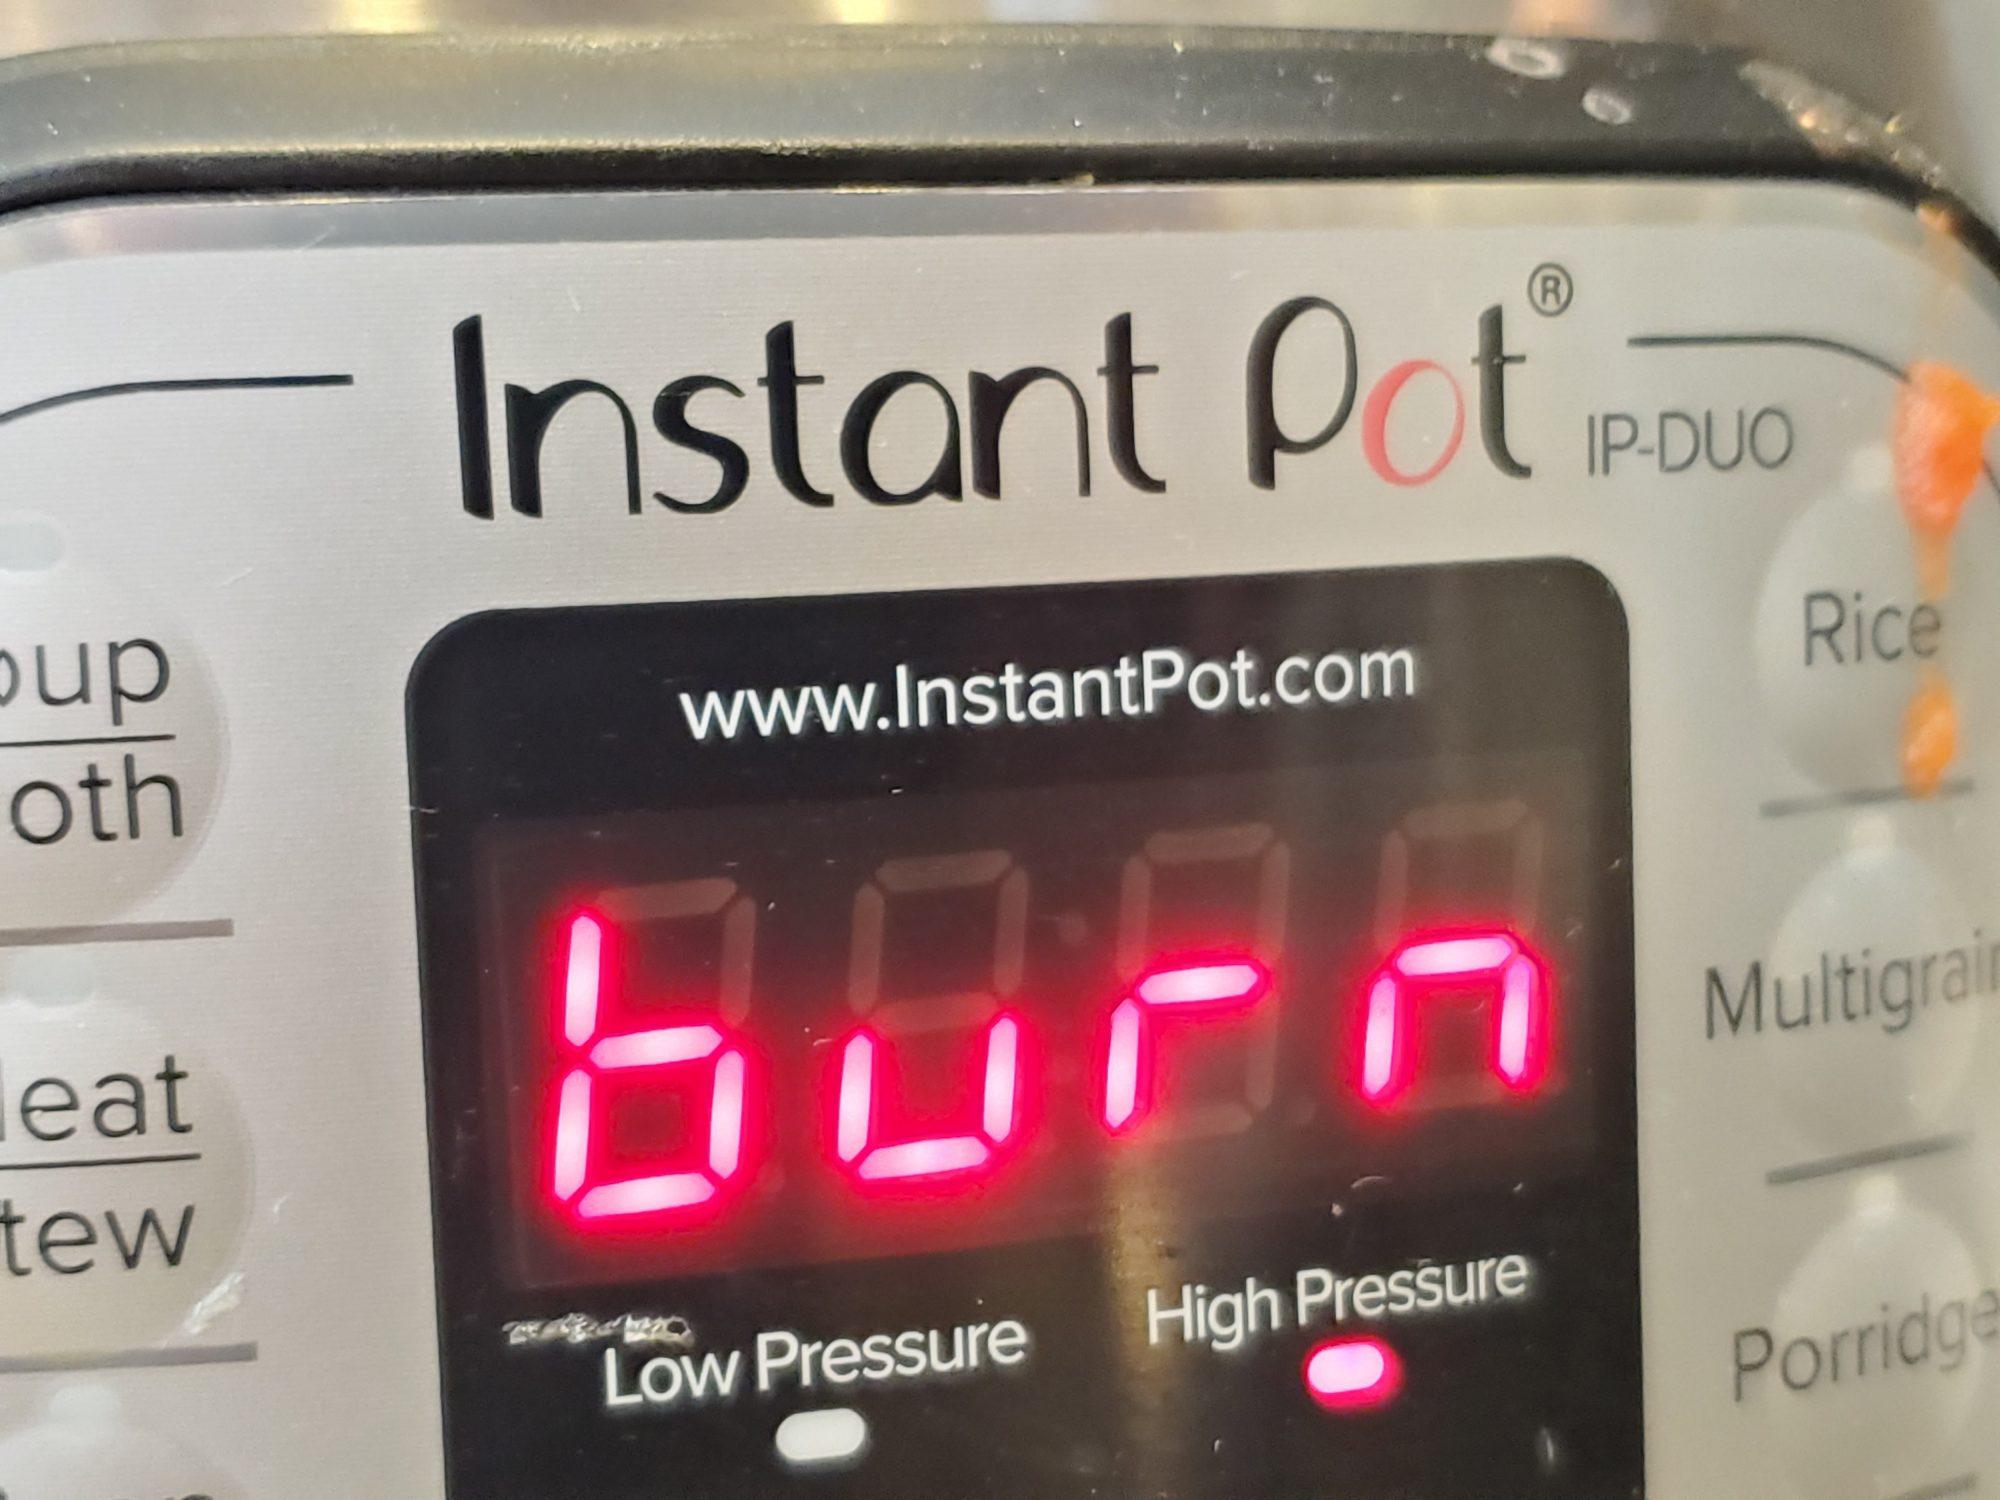 burn notice on instant pot